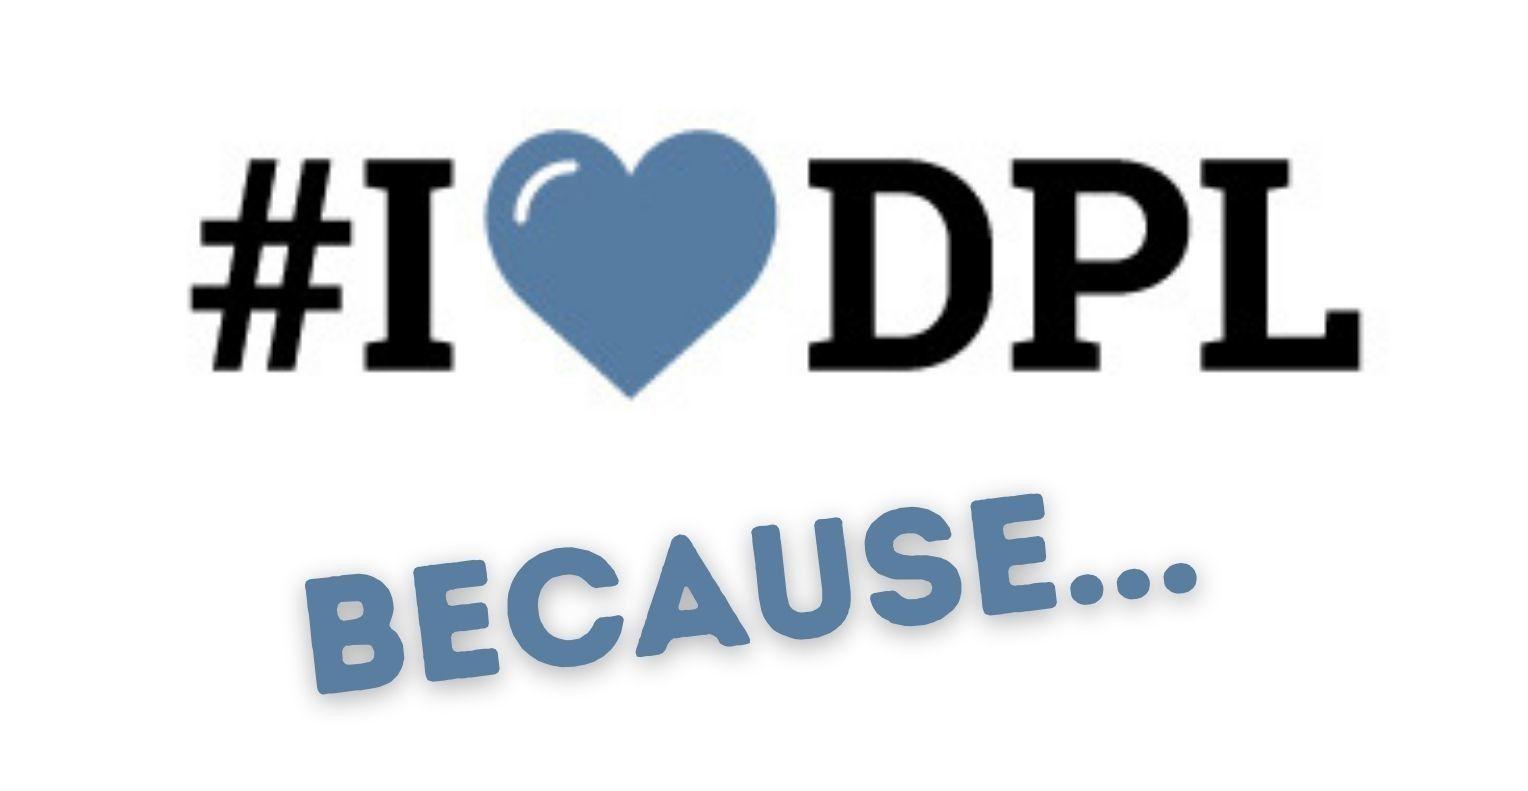 I heart DPL because...